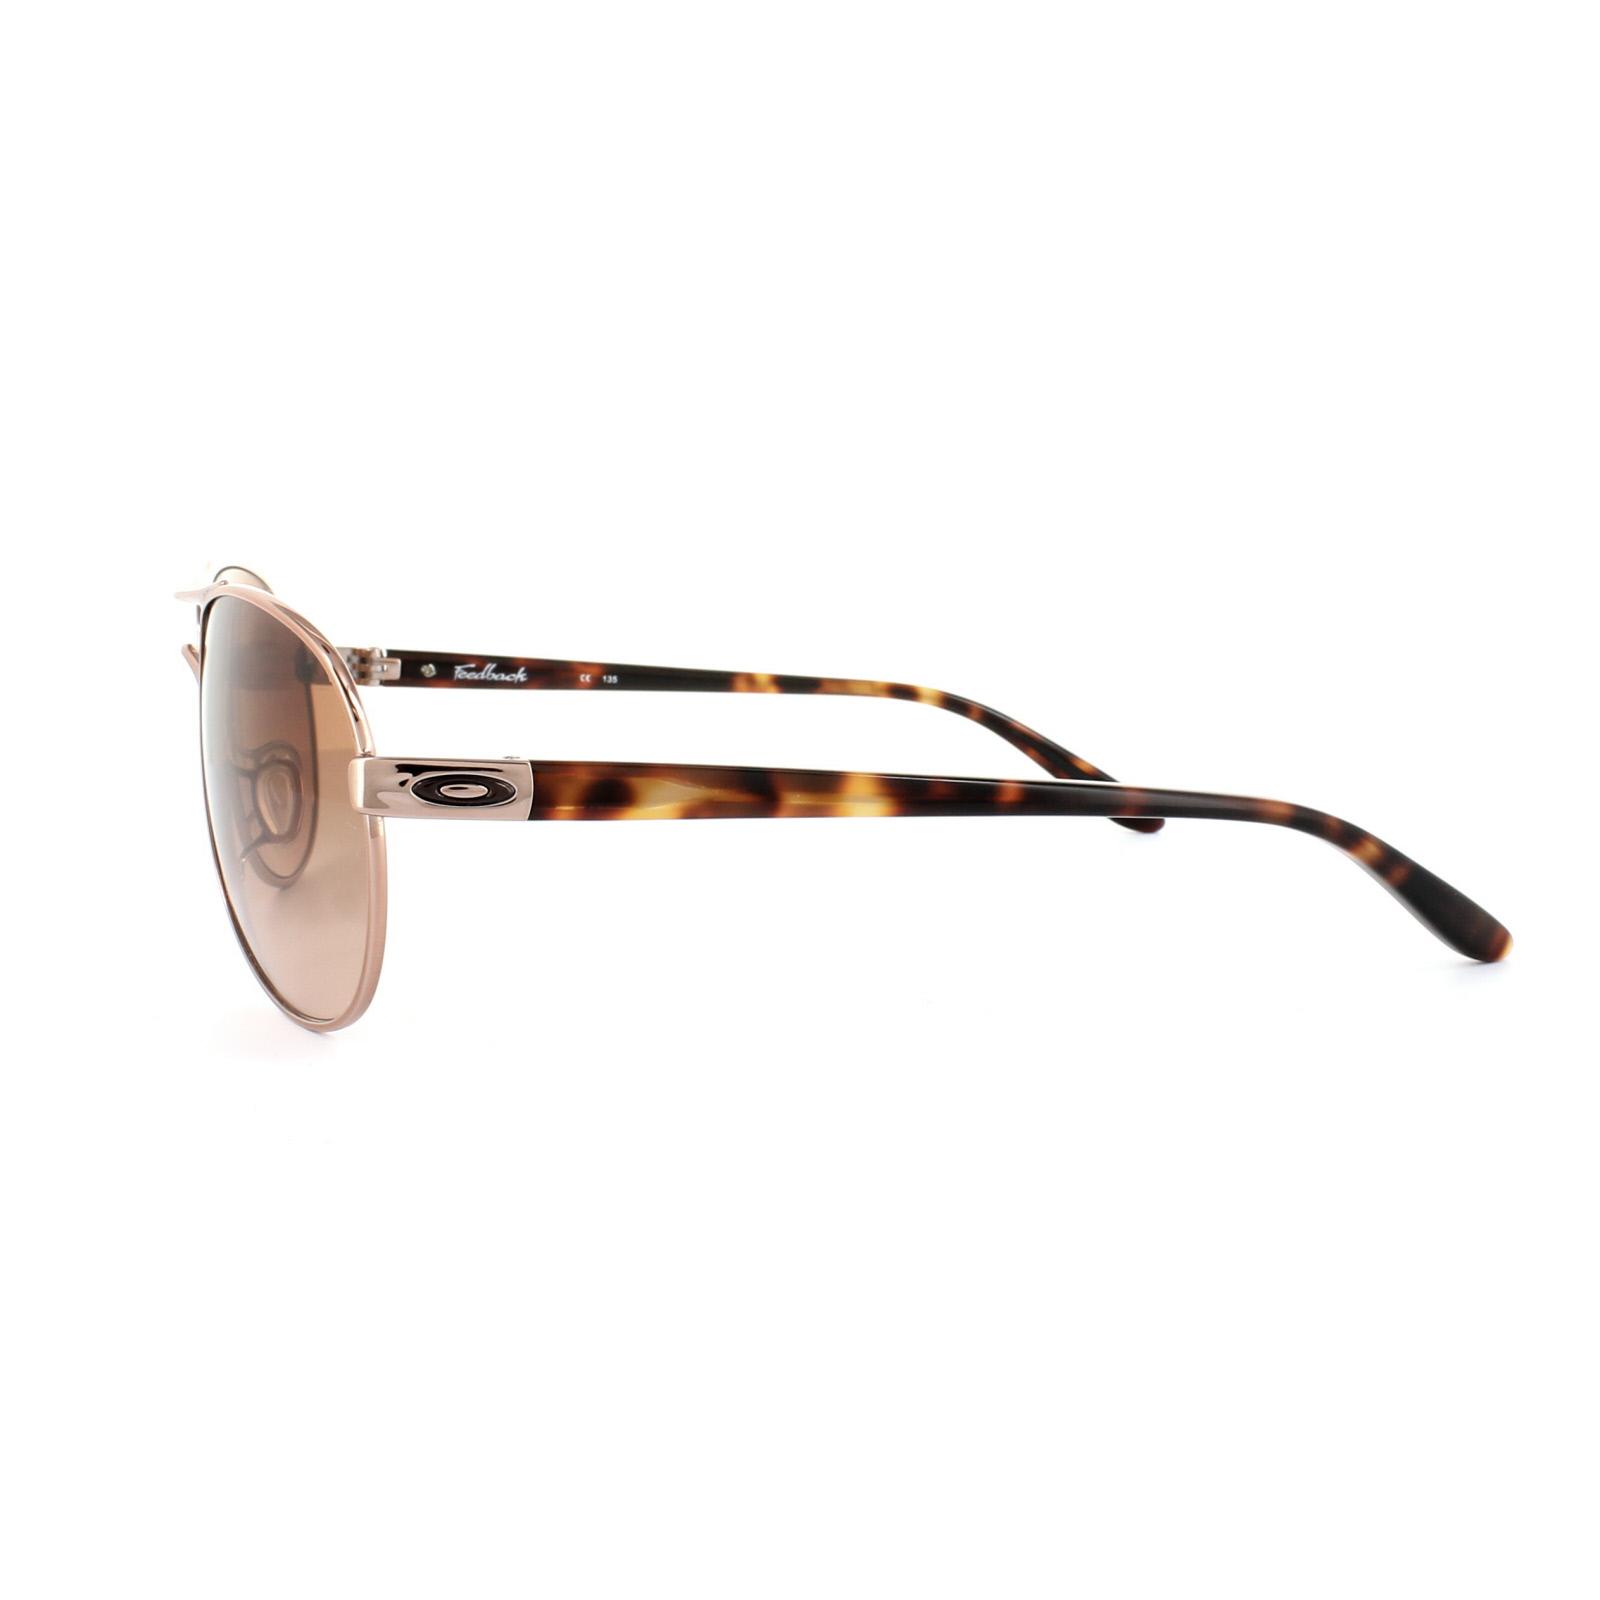 2dc9cc239ab Oakley Feedback Sunglasses - Rose Gold vr50 Brown Gradient